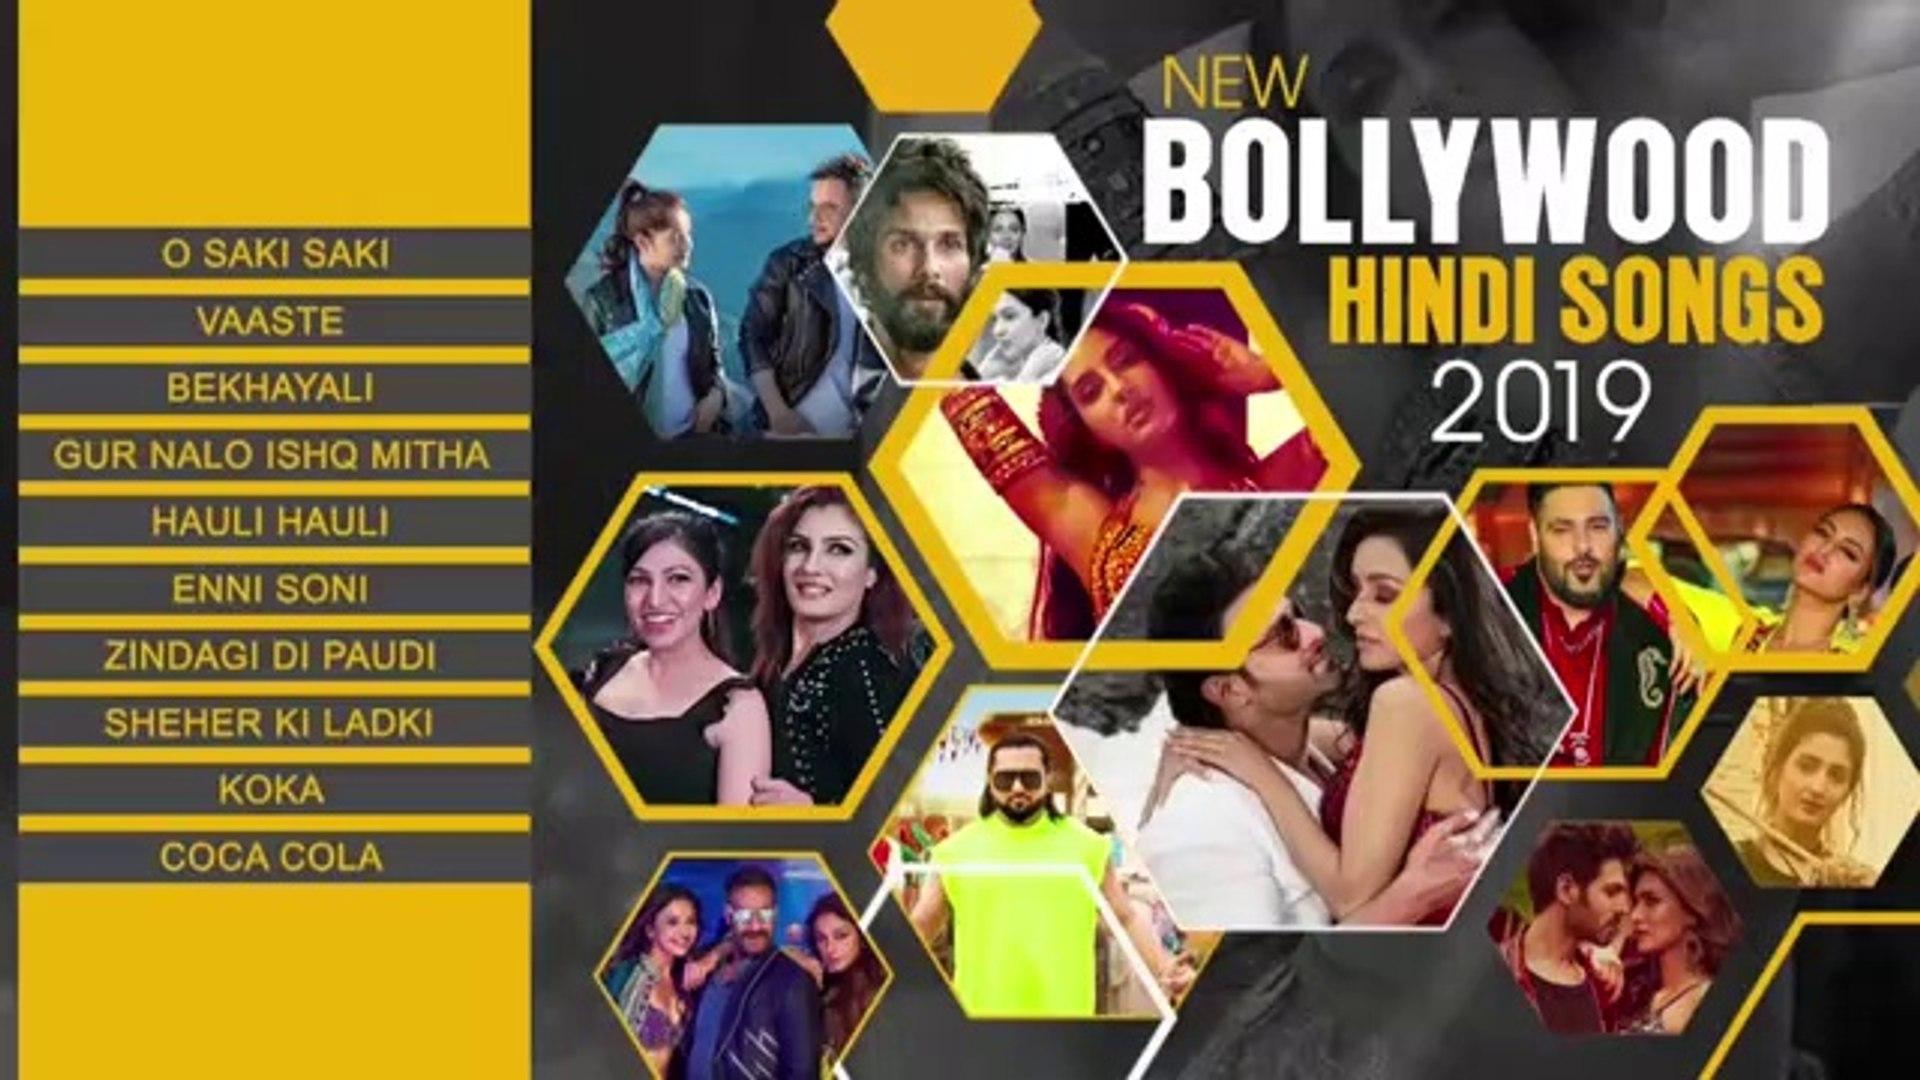 New Bollywood Hindi Songs 2019 Video Jukebox Top Bollywood Songs 2020 Video Dailymotion Do dil mil rahe hain 06:01 : new bollywood hindi songs 2019 video jukebox top bollywood songs 2020